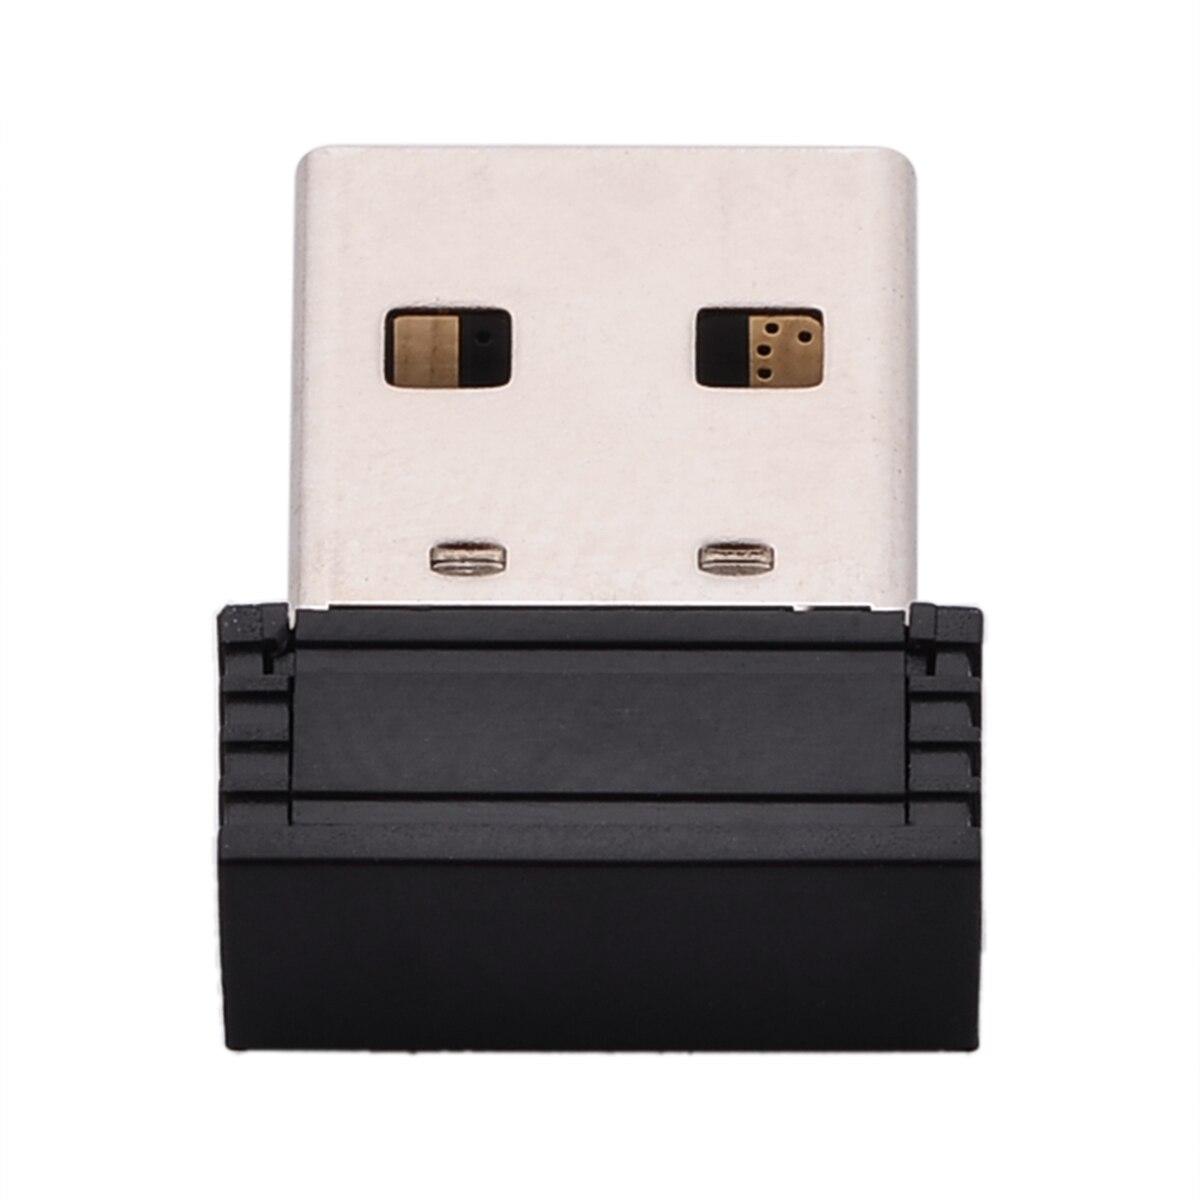 Mini USB ANT Recevier Sensor Cycling For Garmin&Zwift&Wahoo&Bkool&Tacx US